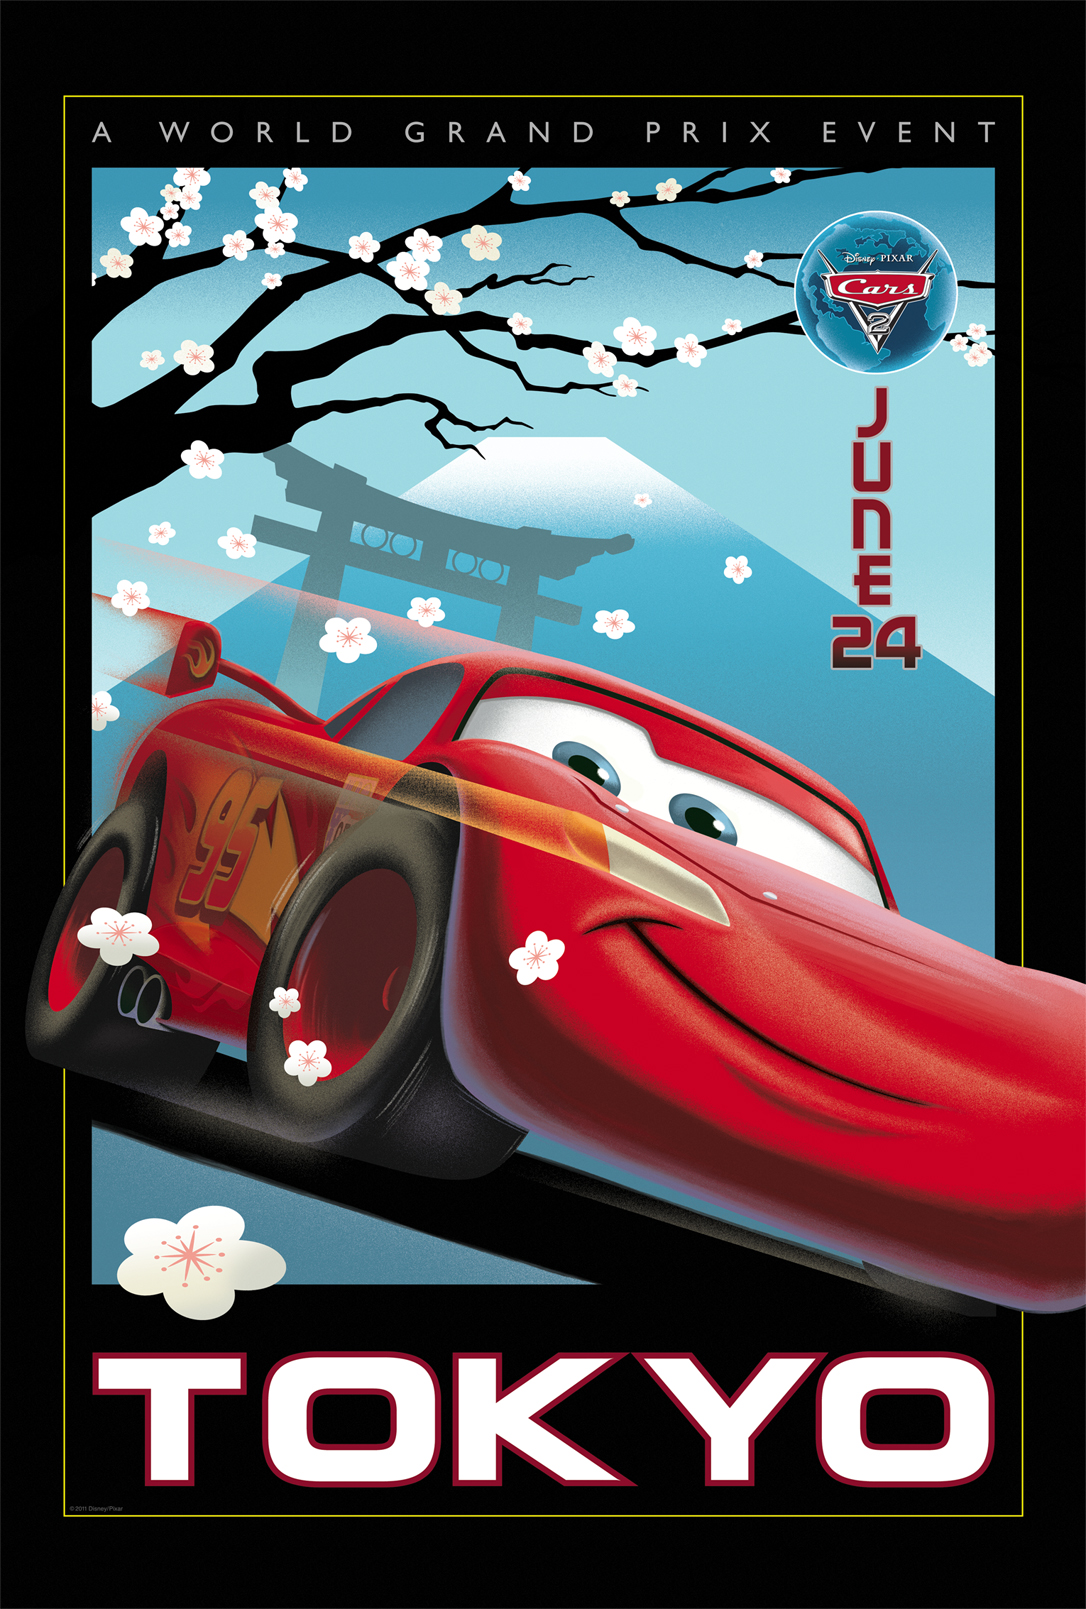 Cars 2 Vintage Poster Art - Tokyo - HeyUGuys